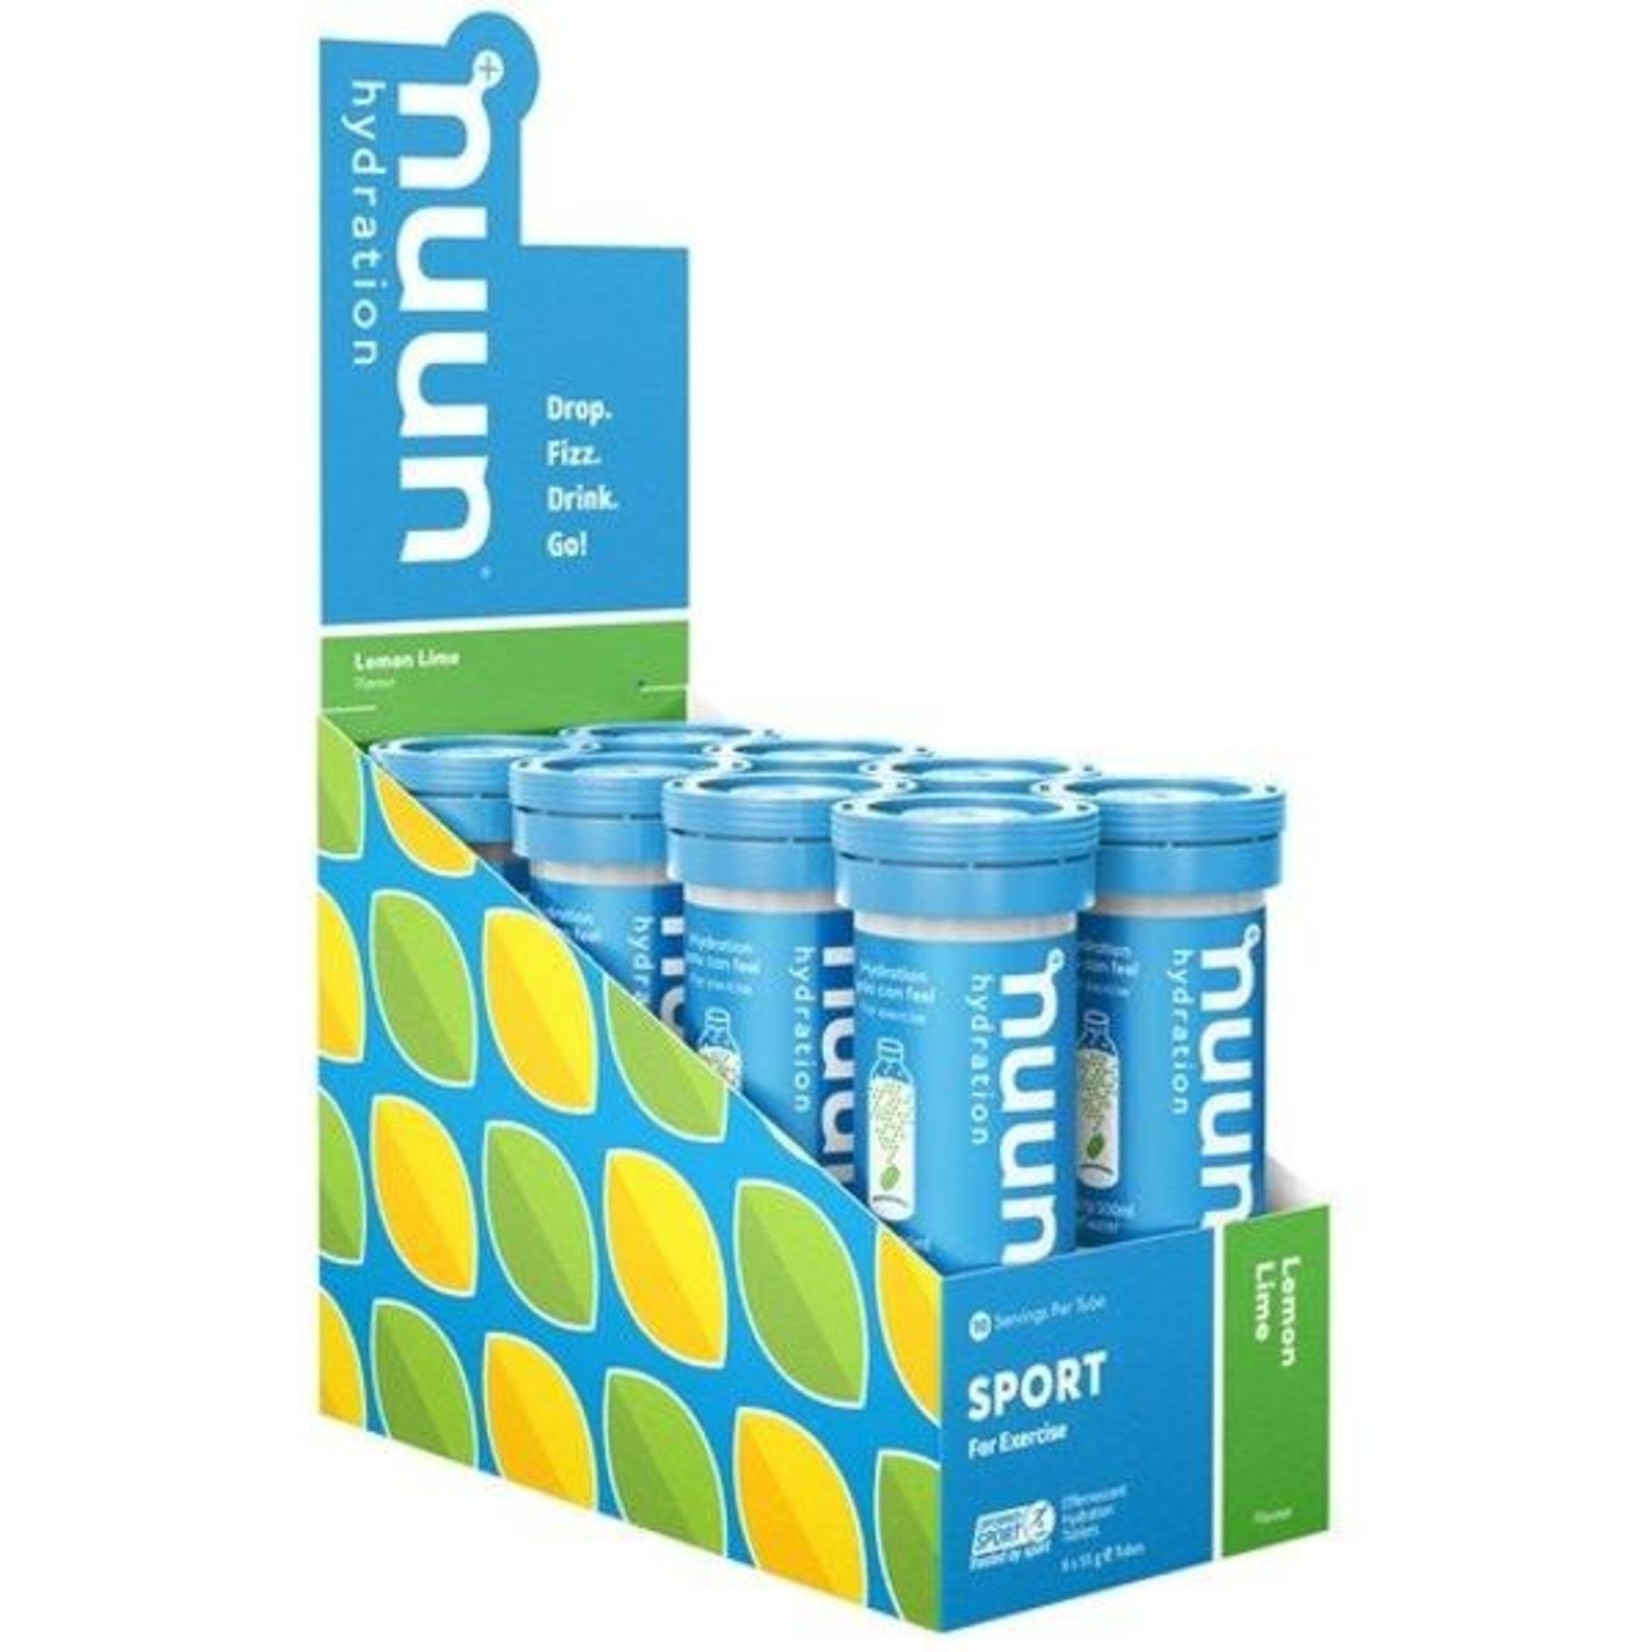 Nuun Hydration Nuun Hydration, Sport Tube Lemon Lime